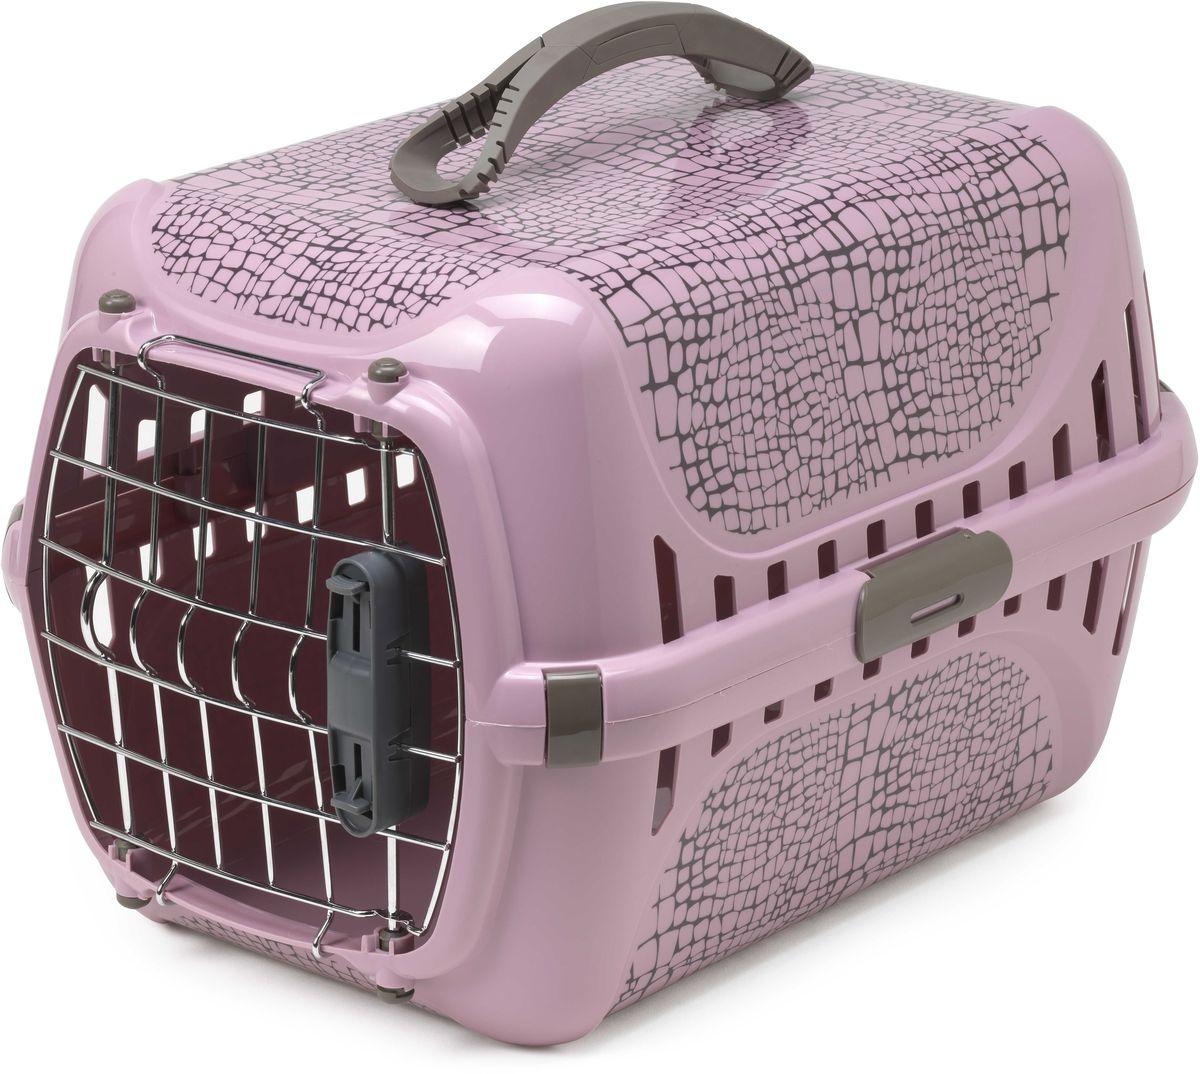 Переноска для авиаперевозок Moderna Trendy Runner. Дикая Природа, цвет: розовый, 51 х 31 х 34 см14T153310